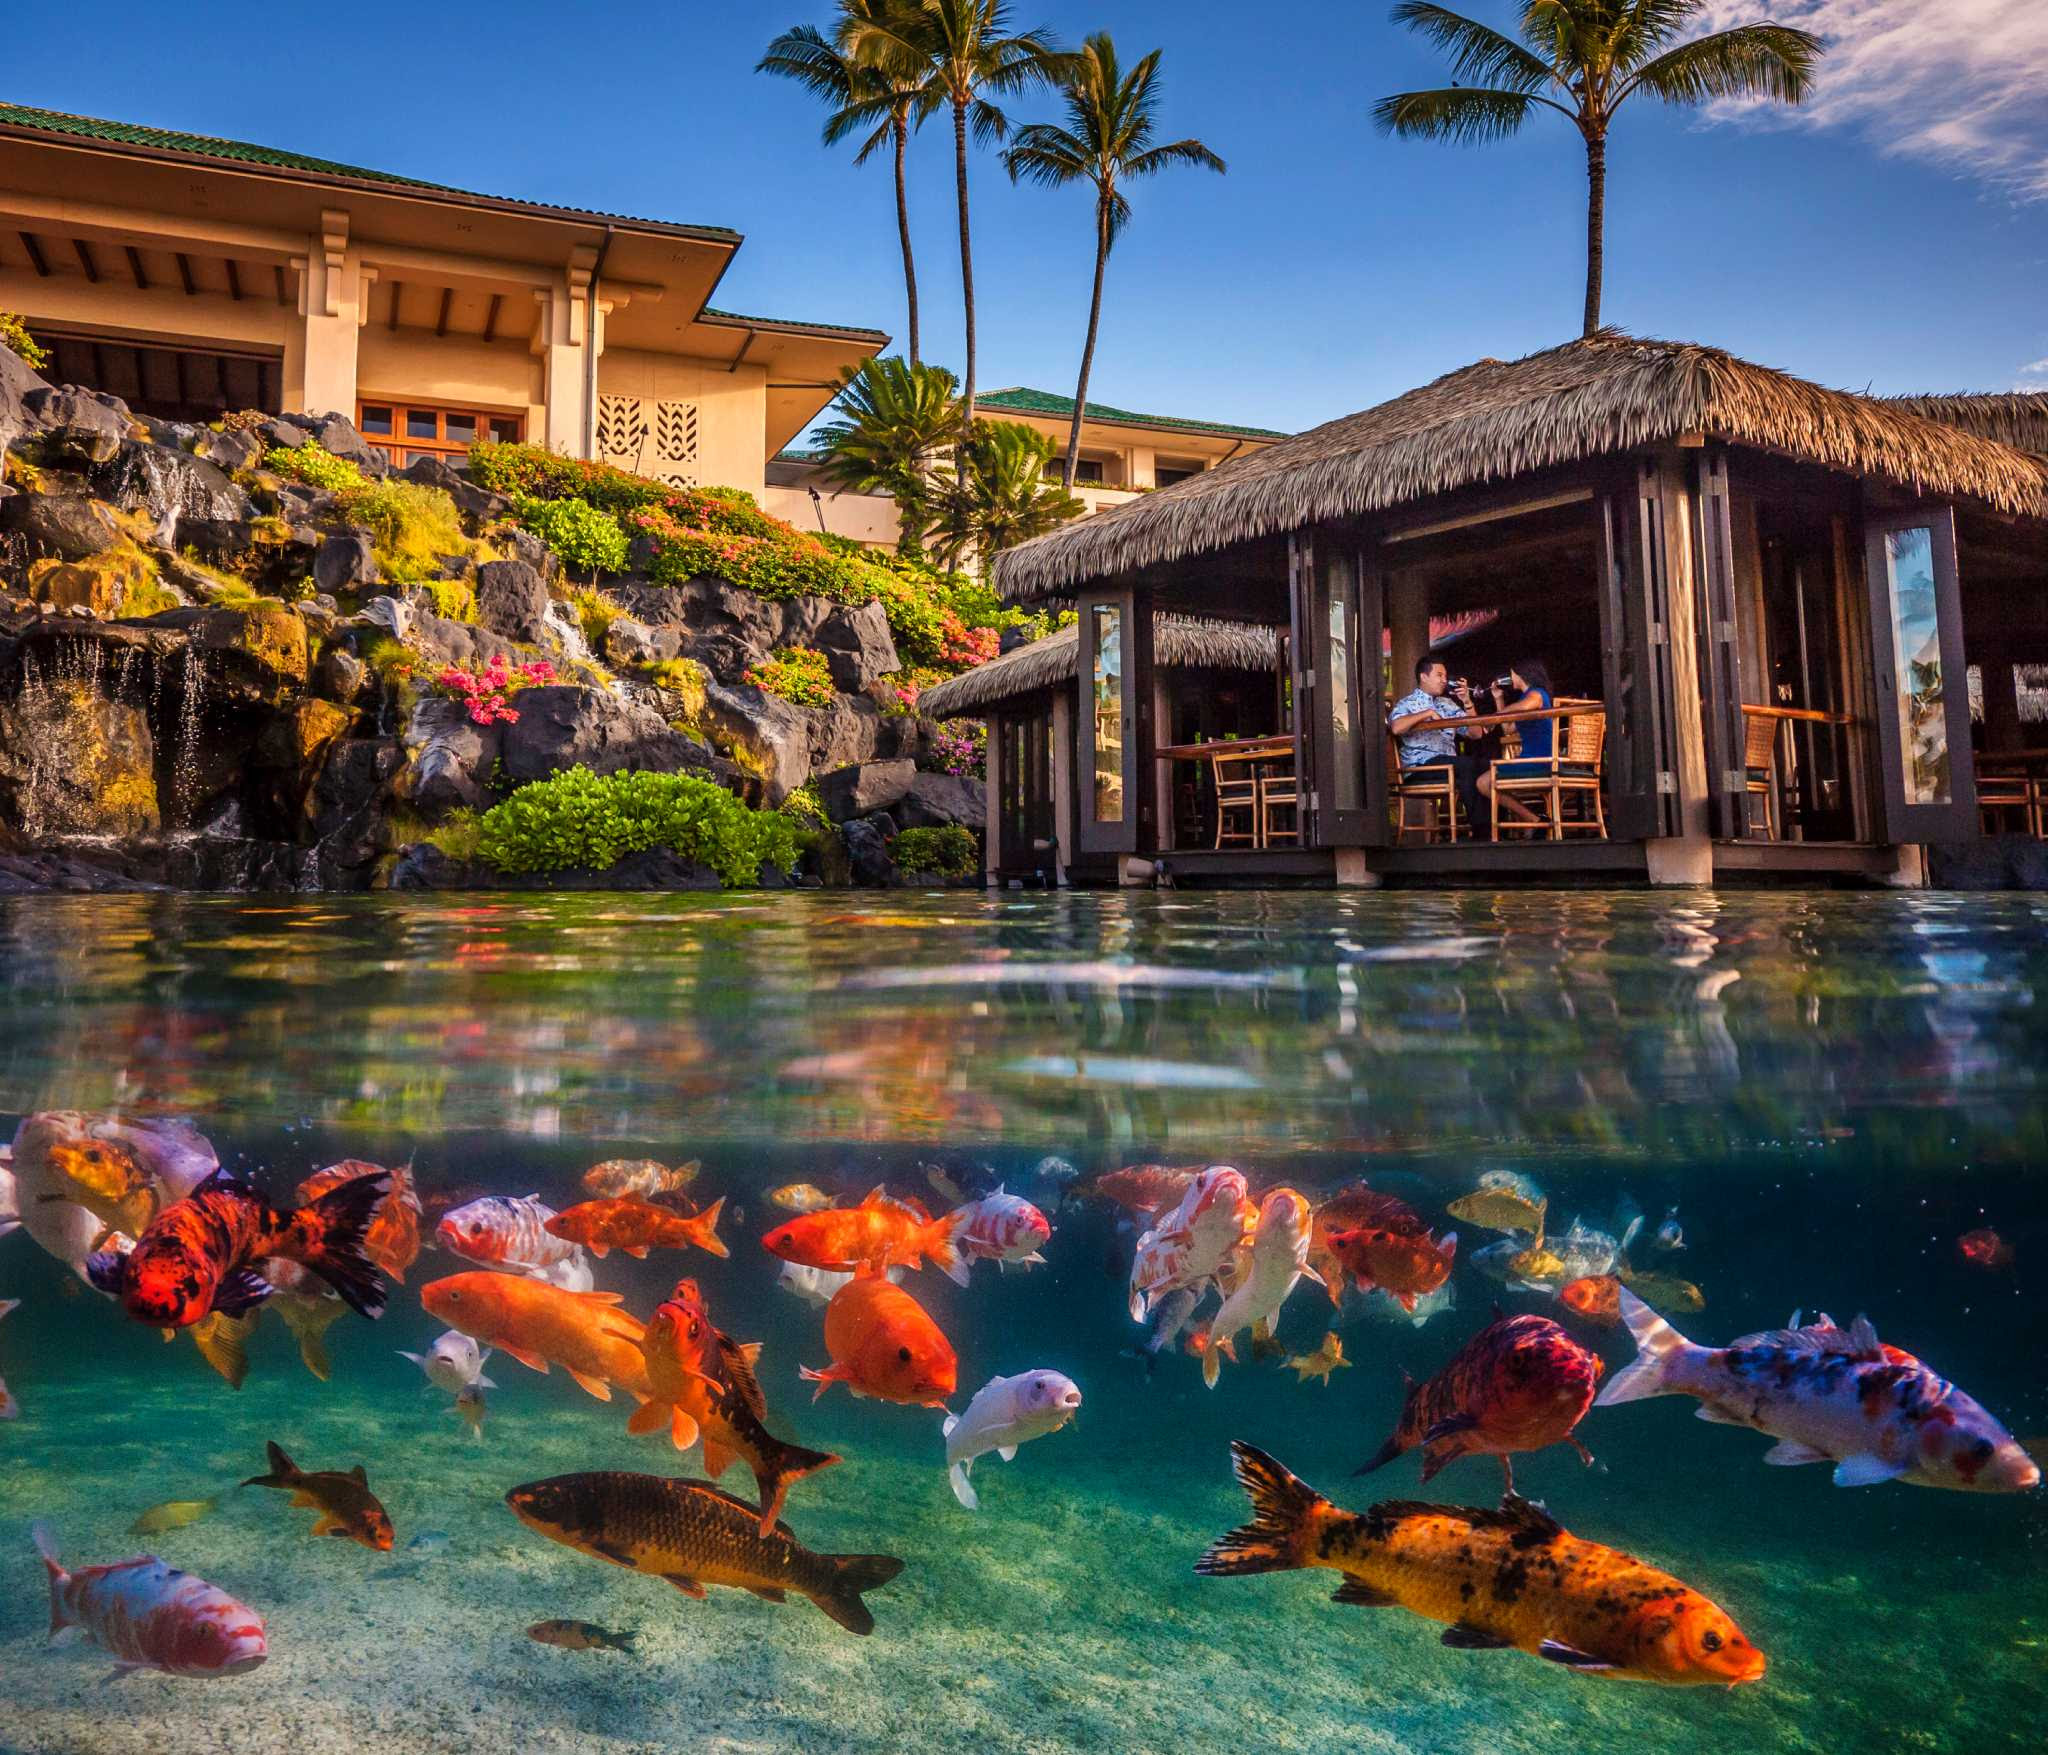 Hawaii resorts act as stewards with gardens land